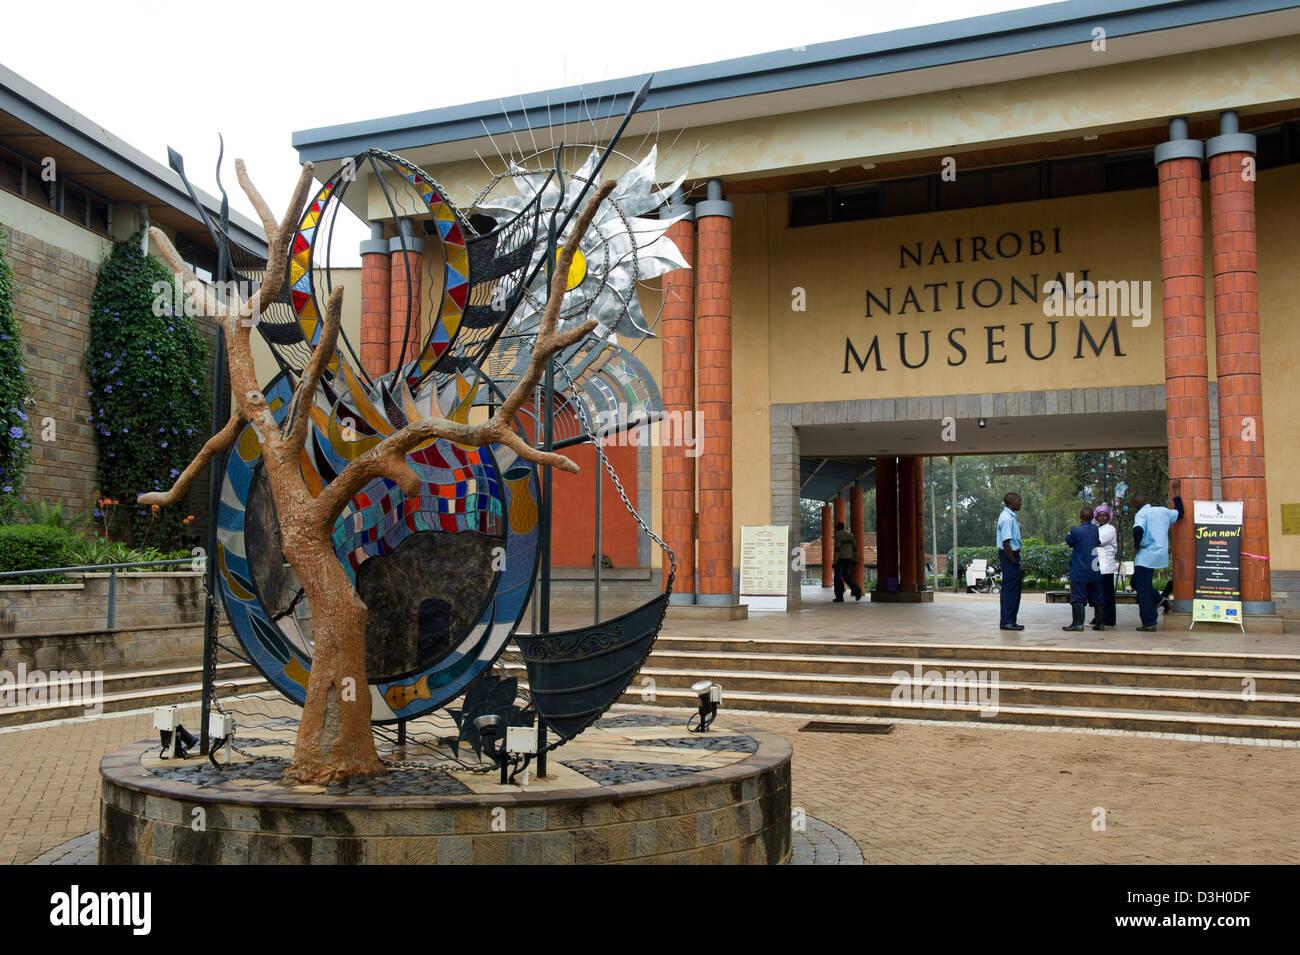 Entrance of the Nairobi National Museum, Nairobi, Kenya Stock Photo